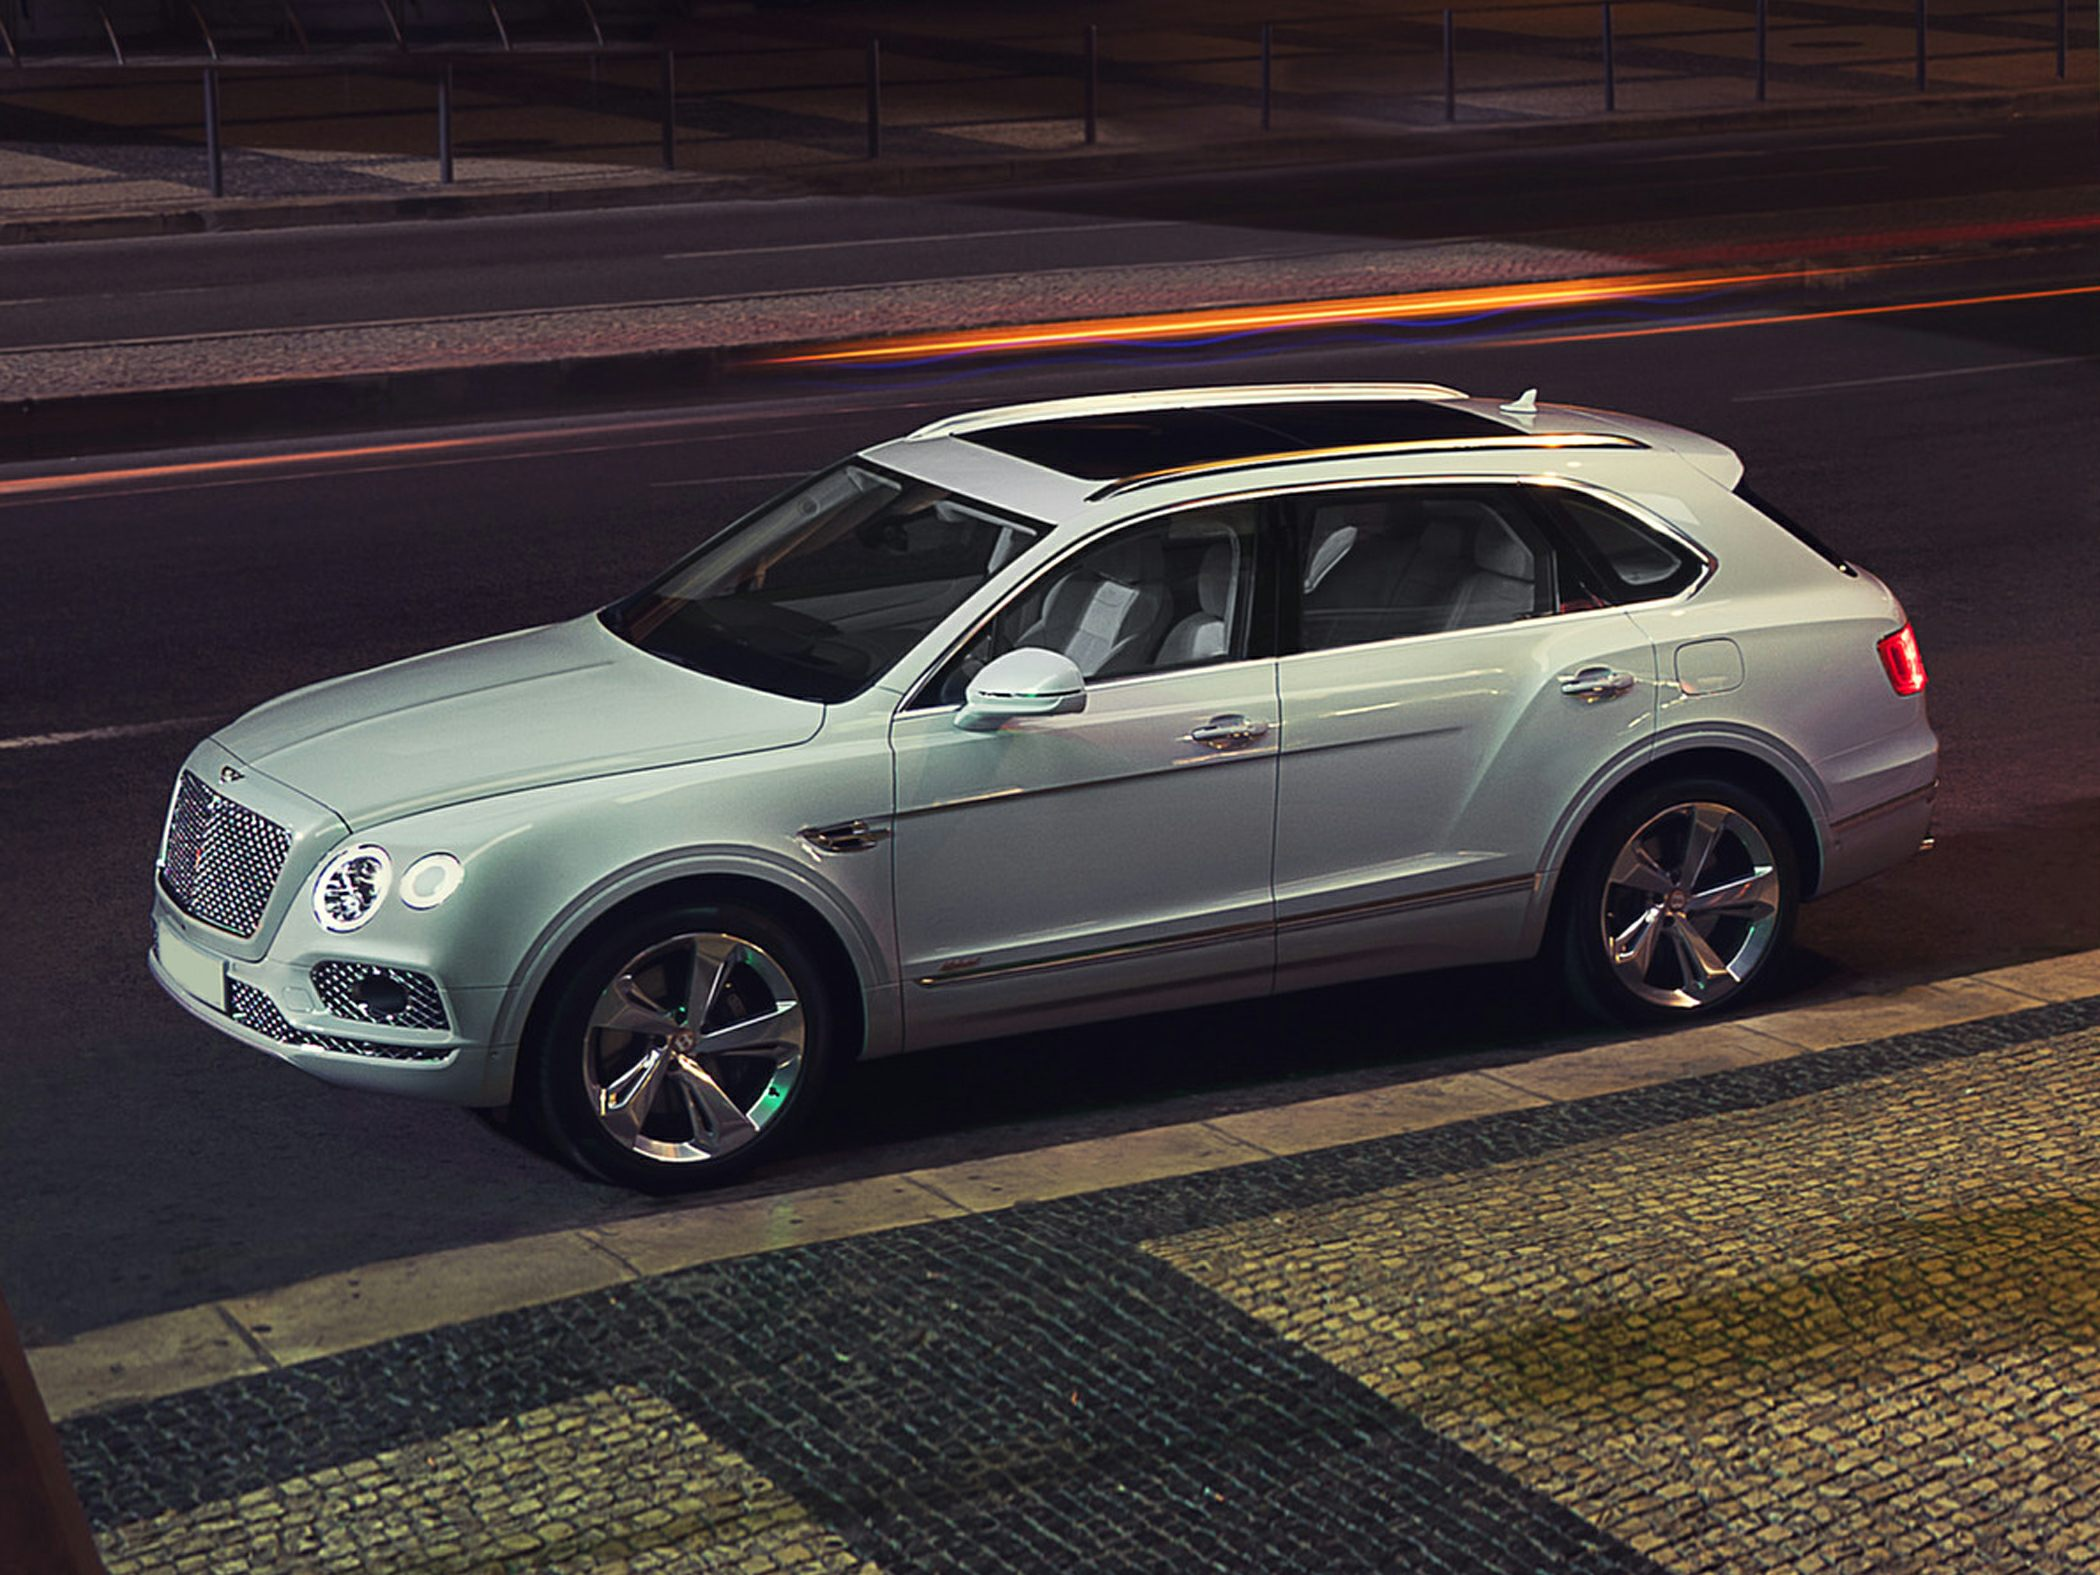 2020 Bentley Bentayga Hybrid Pictures